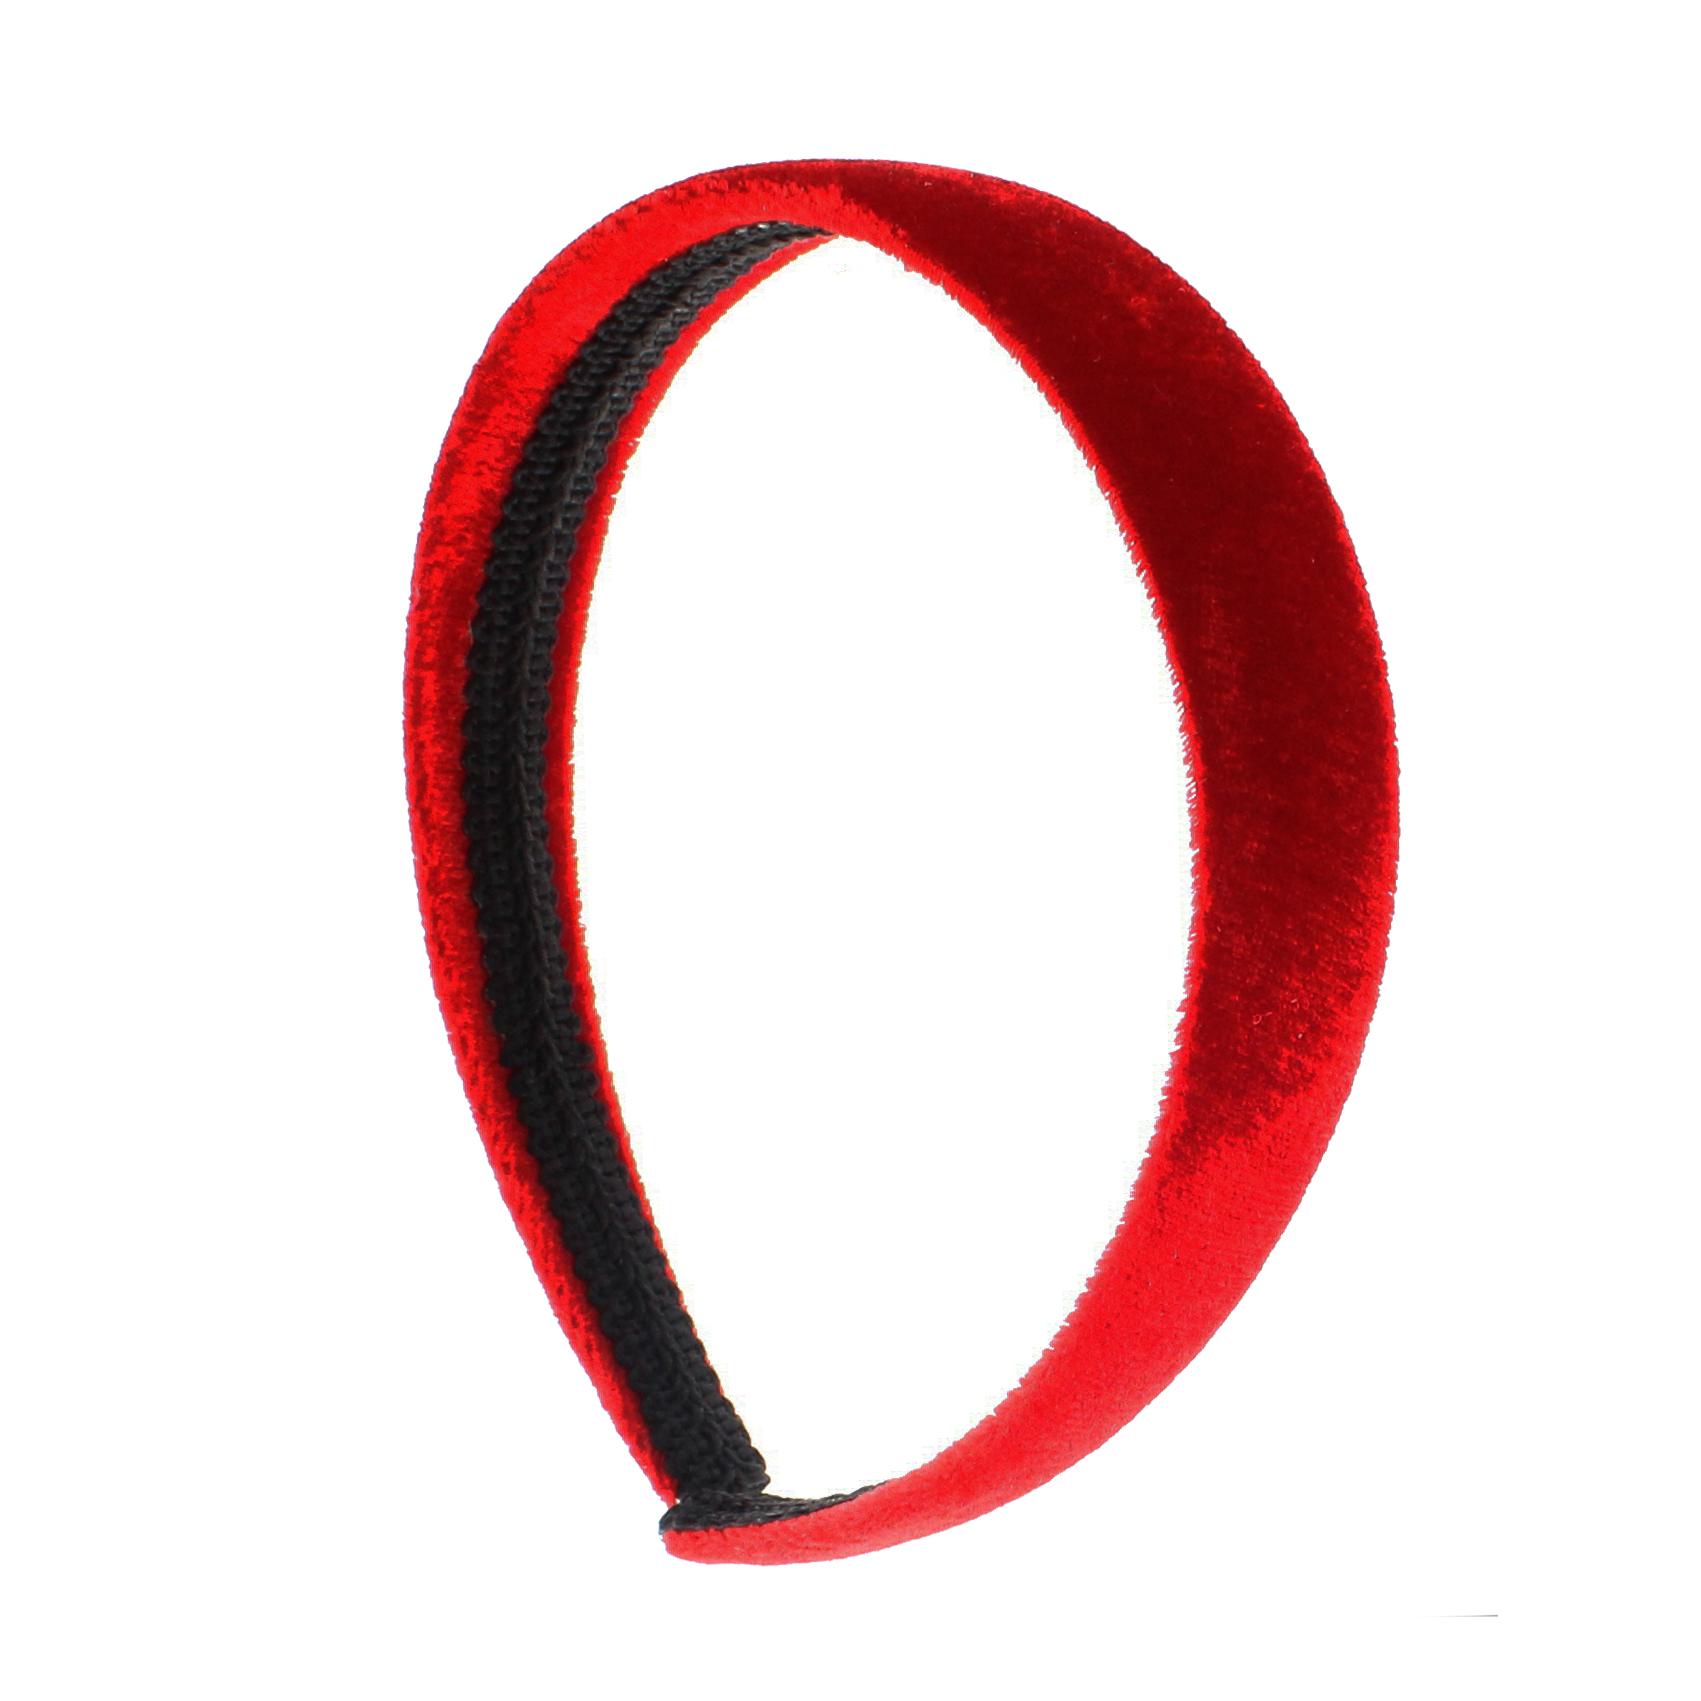 Red School Hair Accessories Headband Elastic etc… Scrunchie